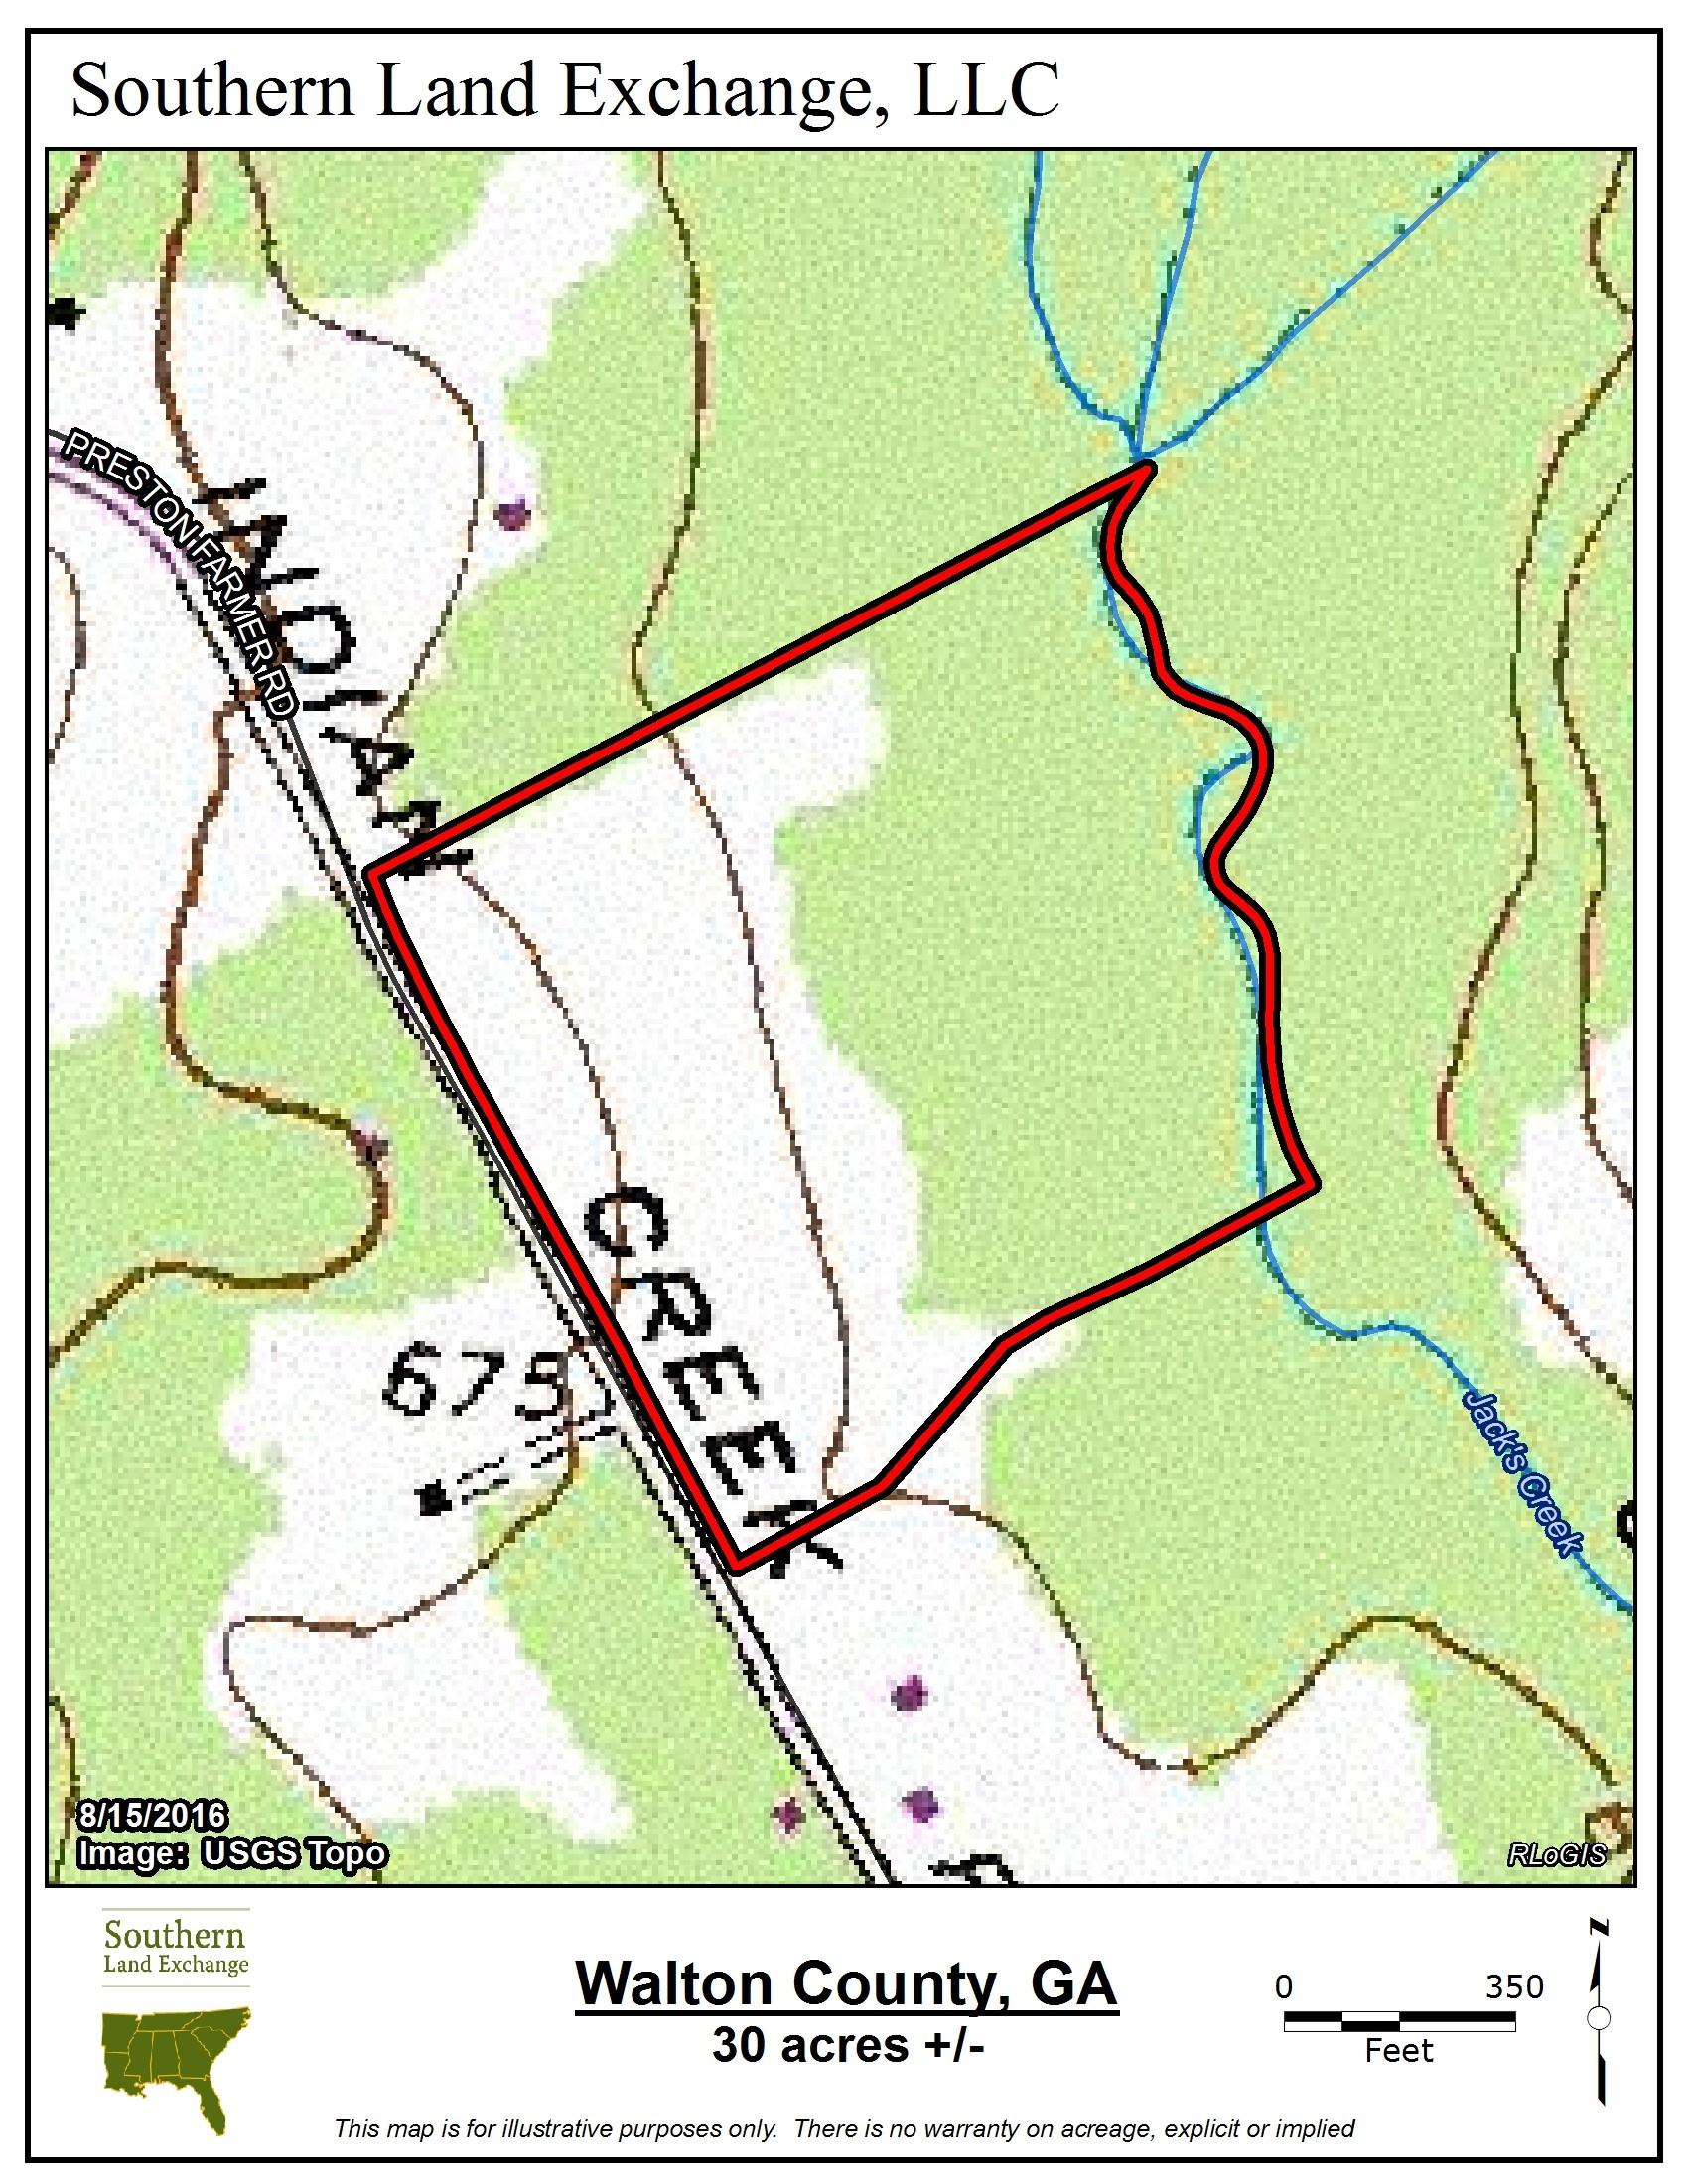 Walton30_Topo.jpg - 30 acres of Recreational Land / Hunting Land for sale. 2650 Preston  Road, Good Hope, GA